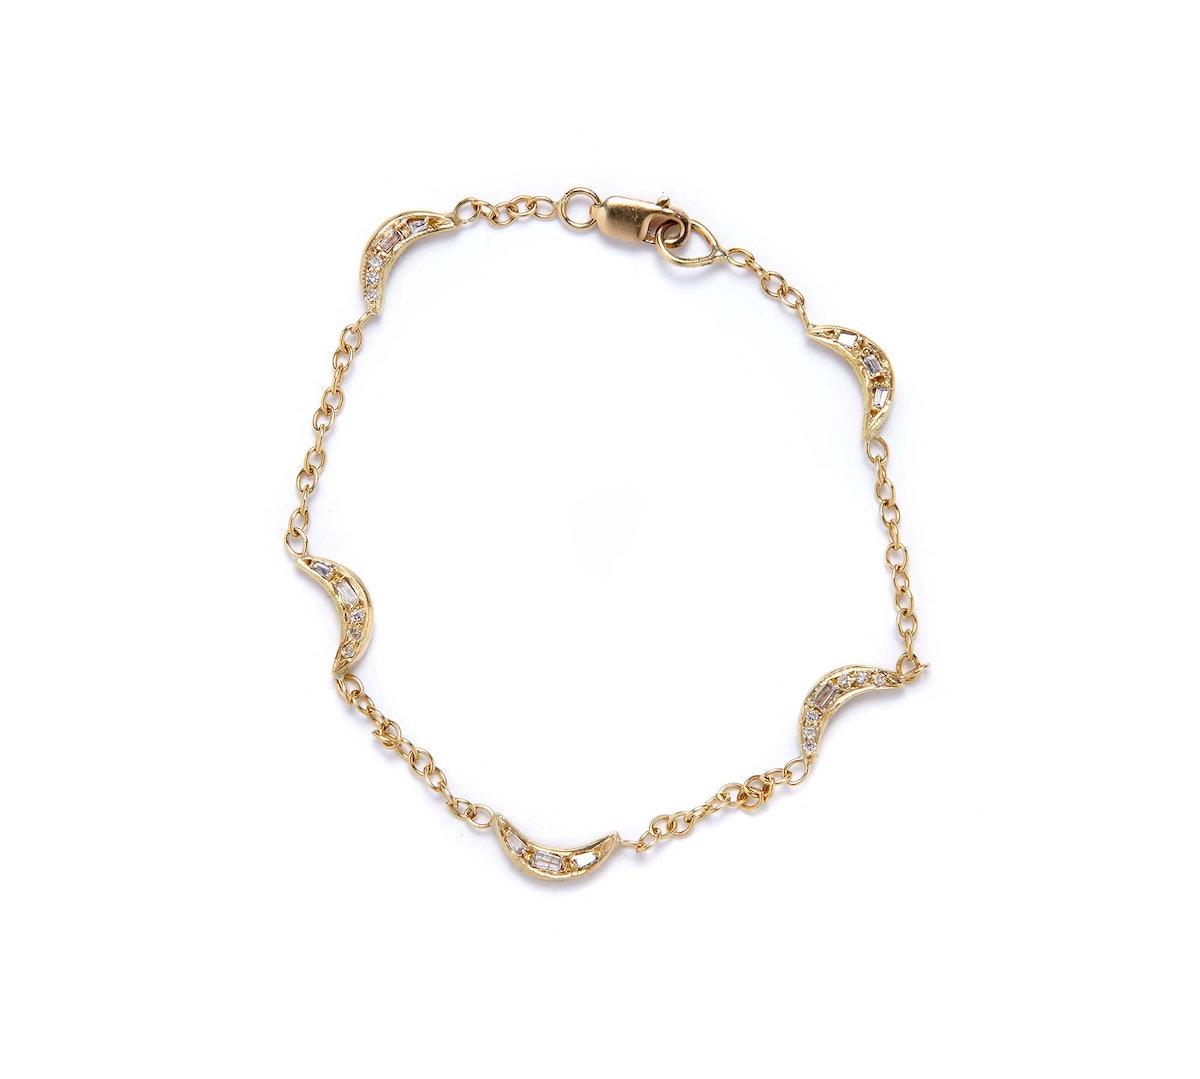 Elisa Solomon 18k yellow gold and diamond bracelet